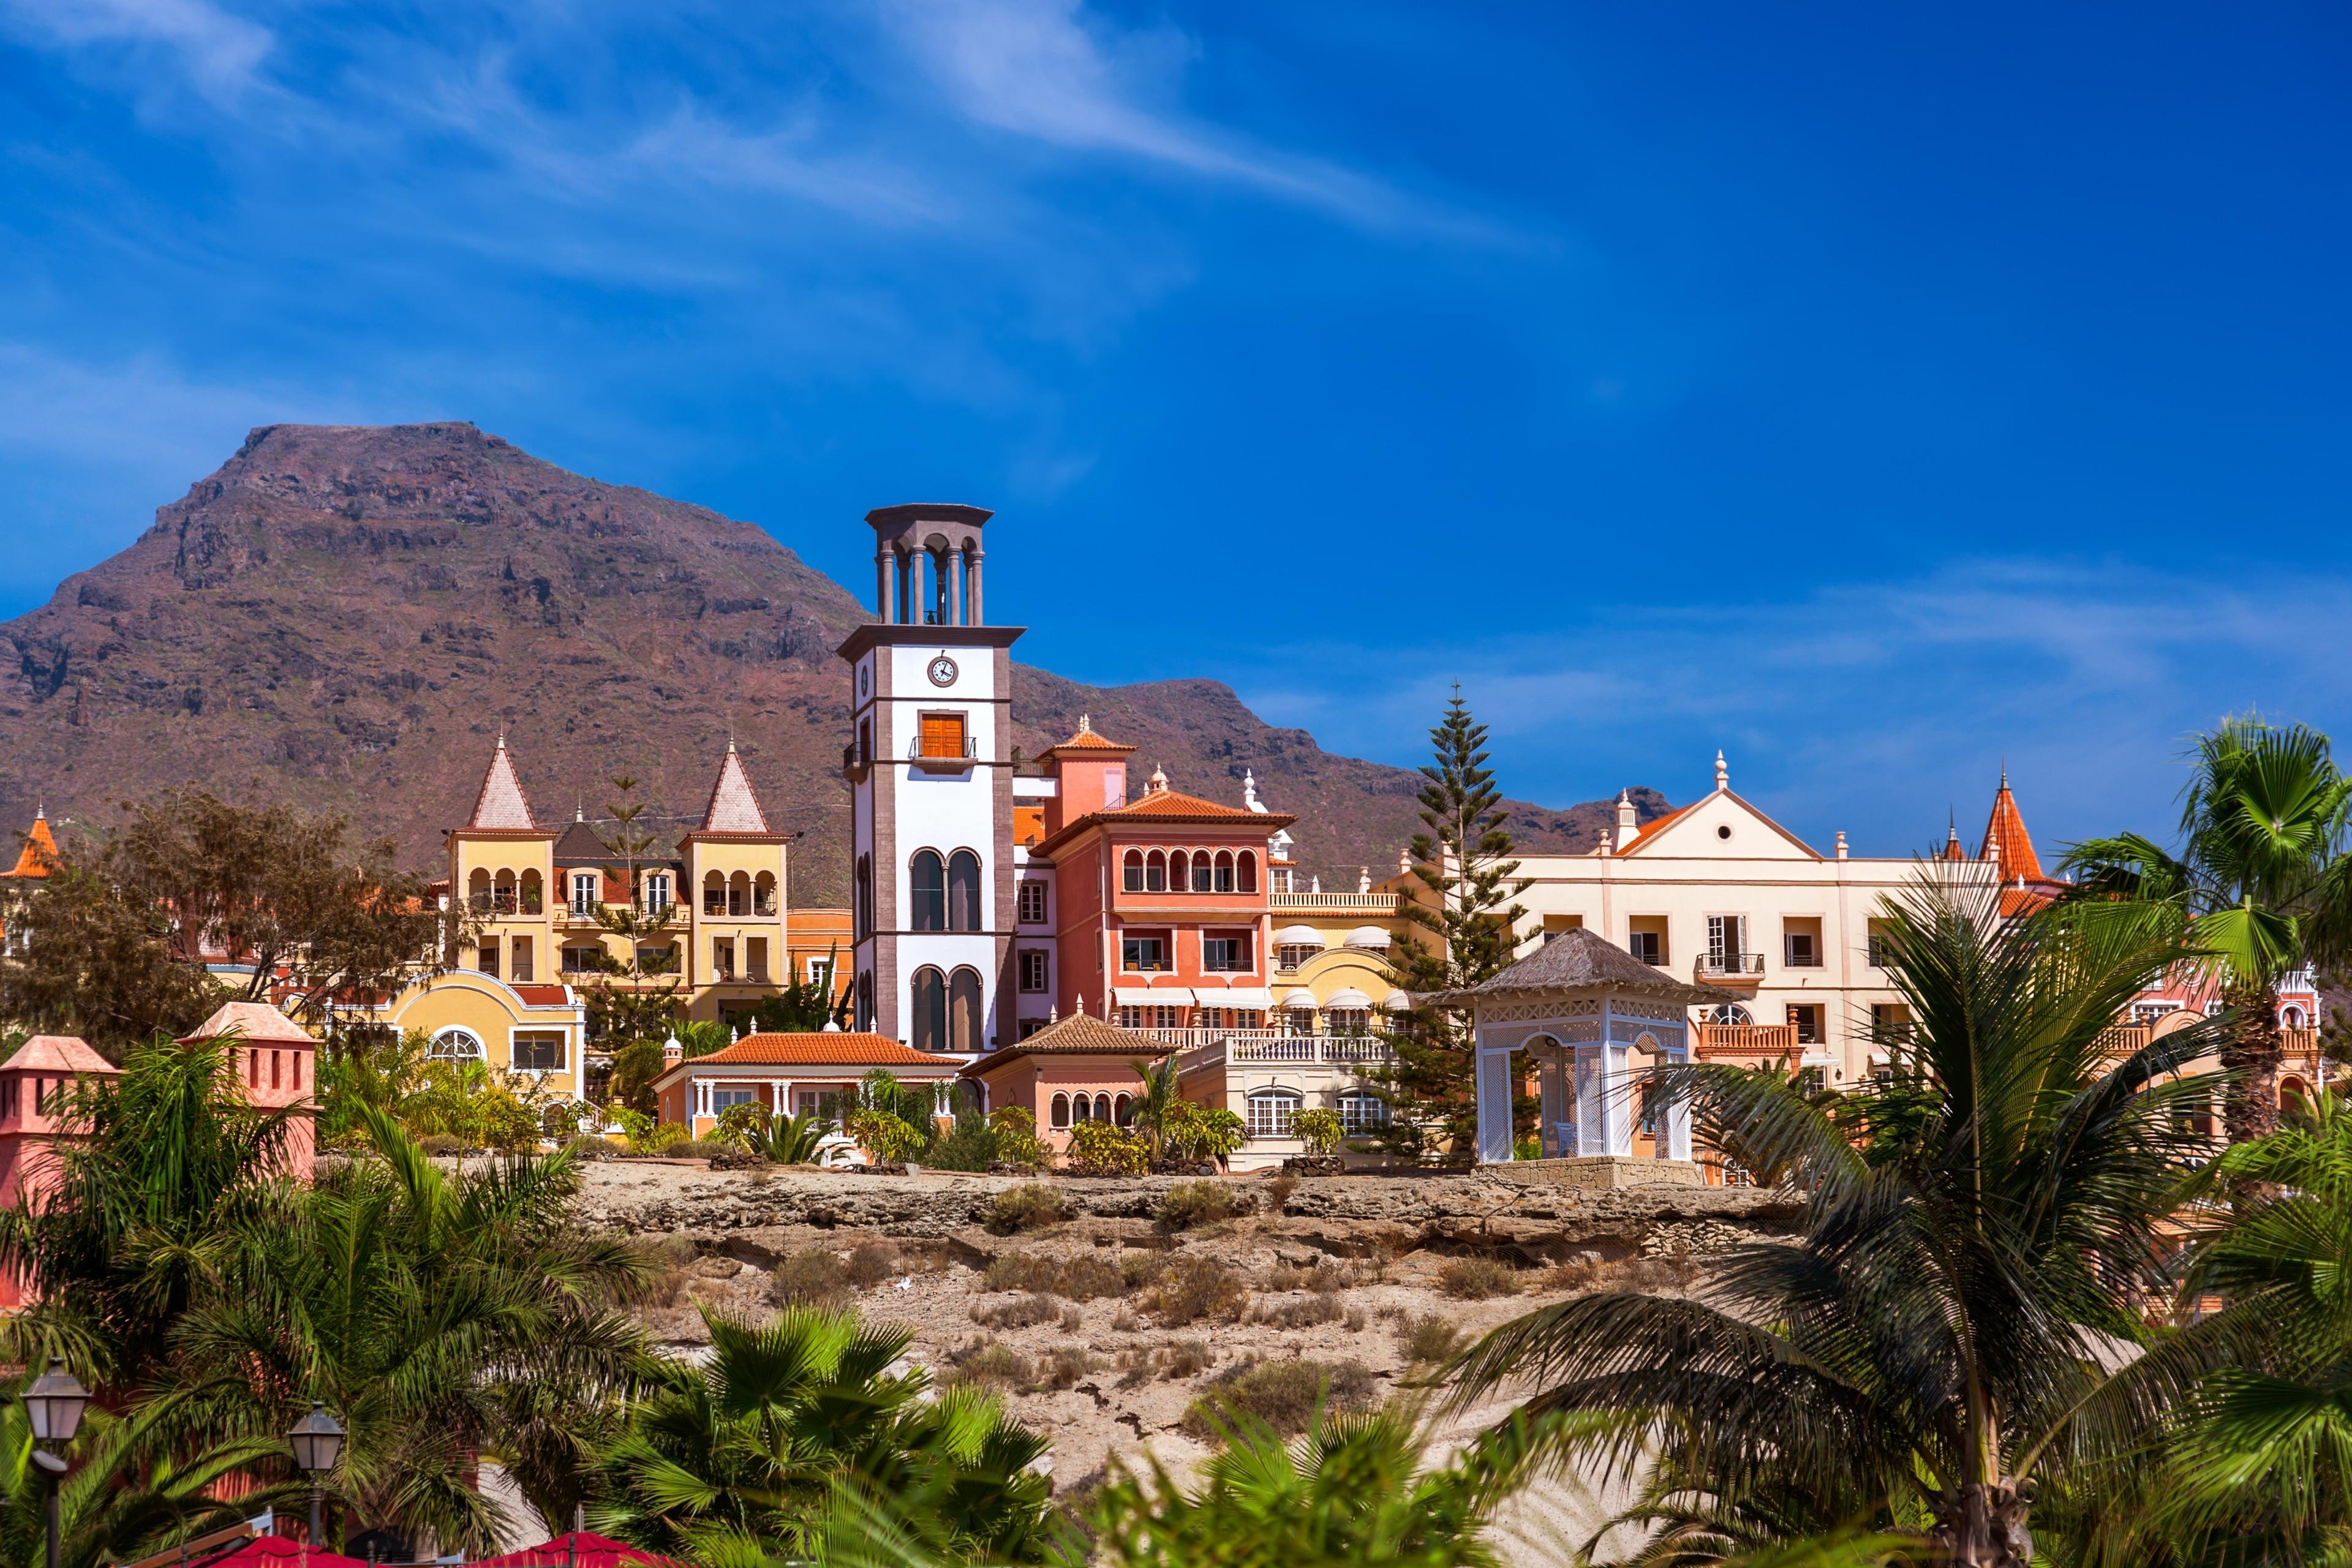 Playa de las Américas, Arona, Canary Islands, Spain